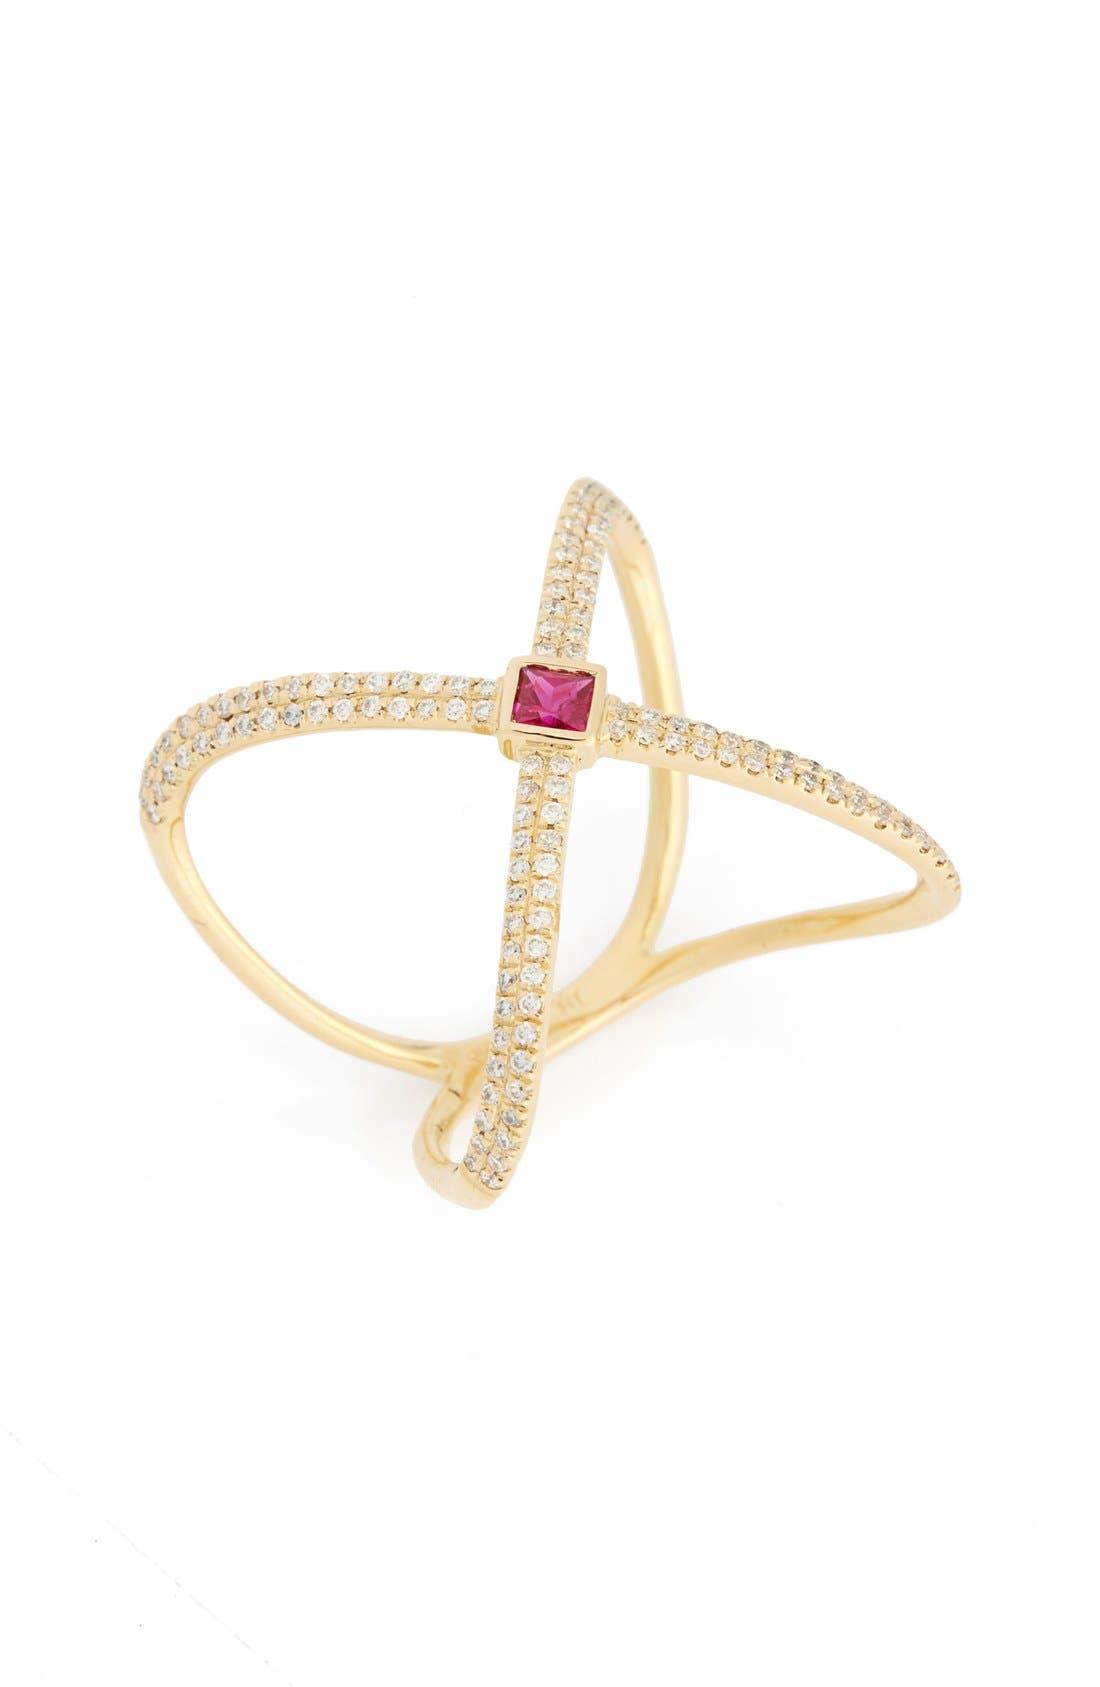 BONY LEVY Diamond & Gem Crossover Ring